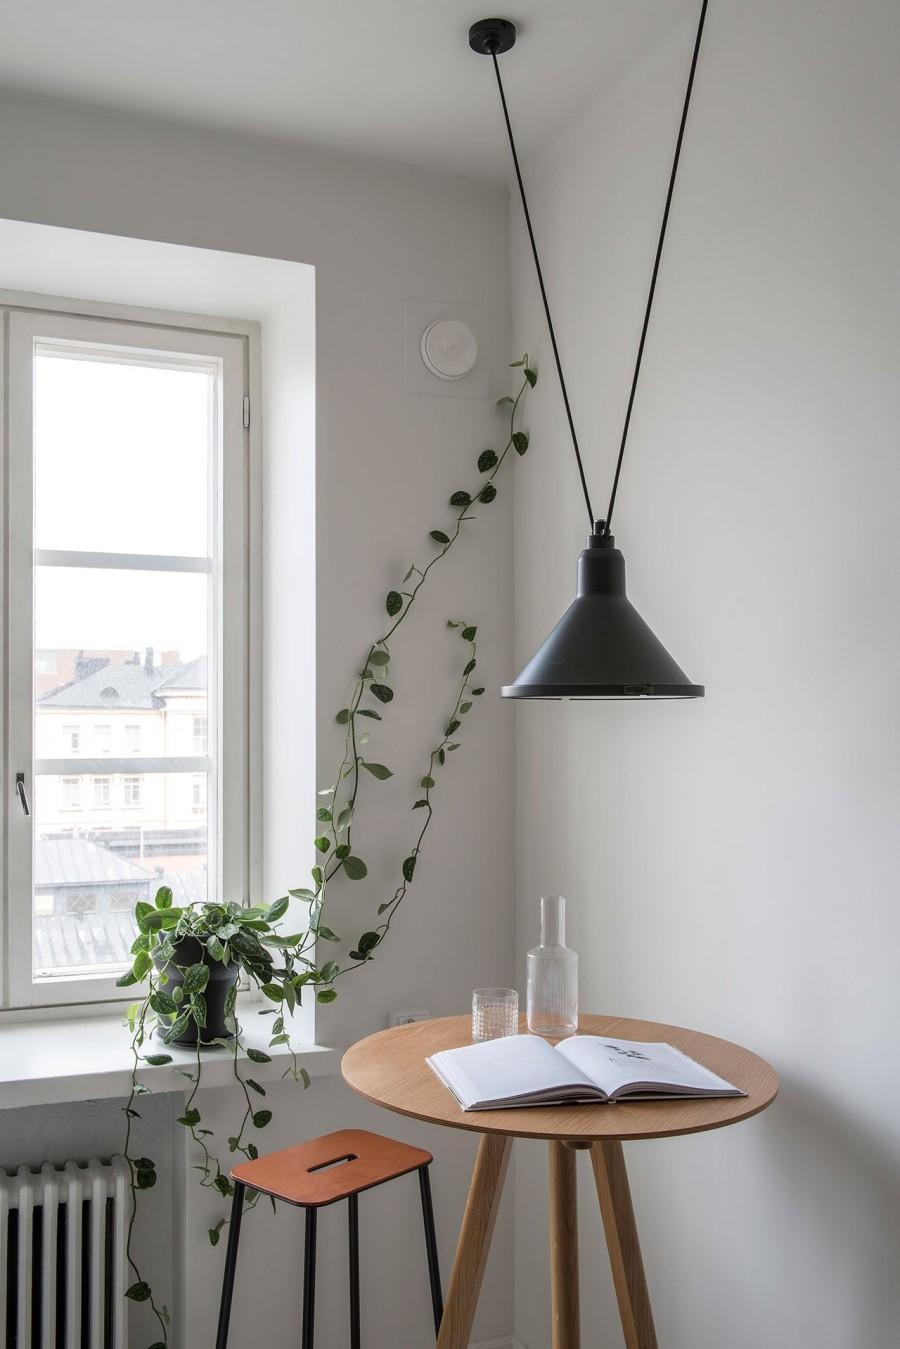 house-laura-seppanen-aprilandmay-5